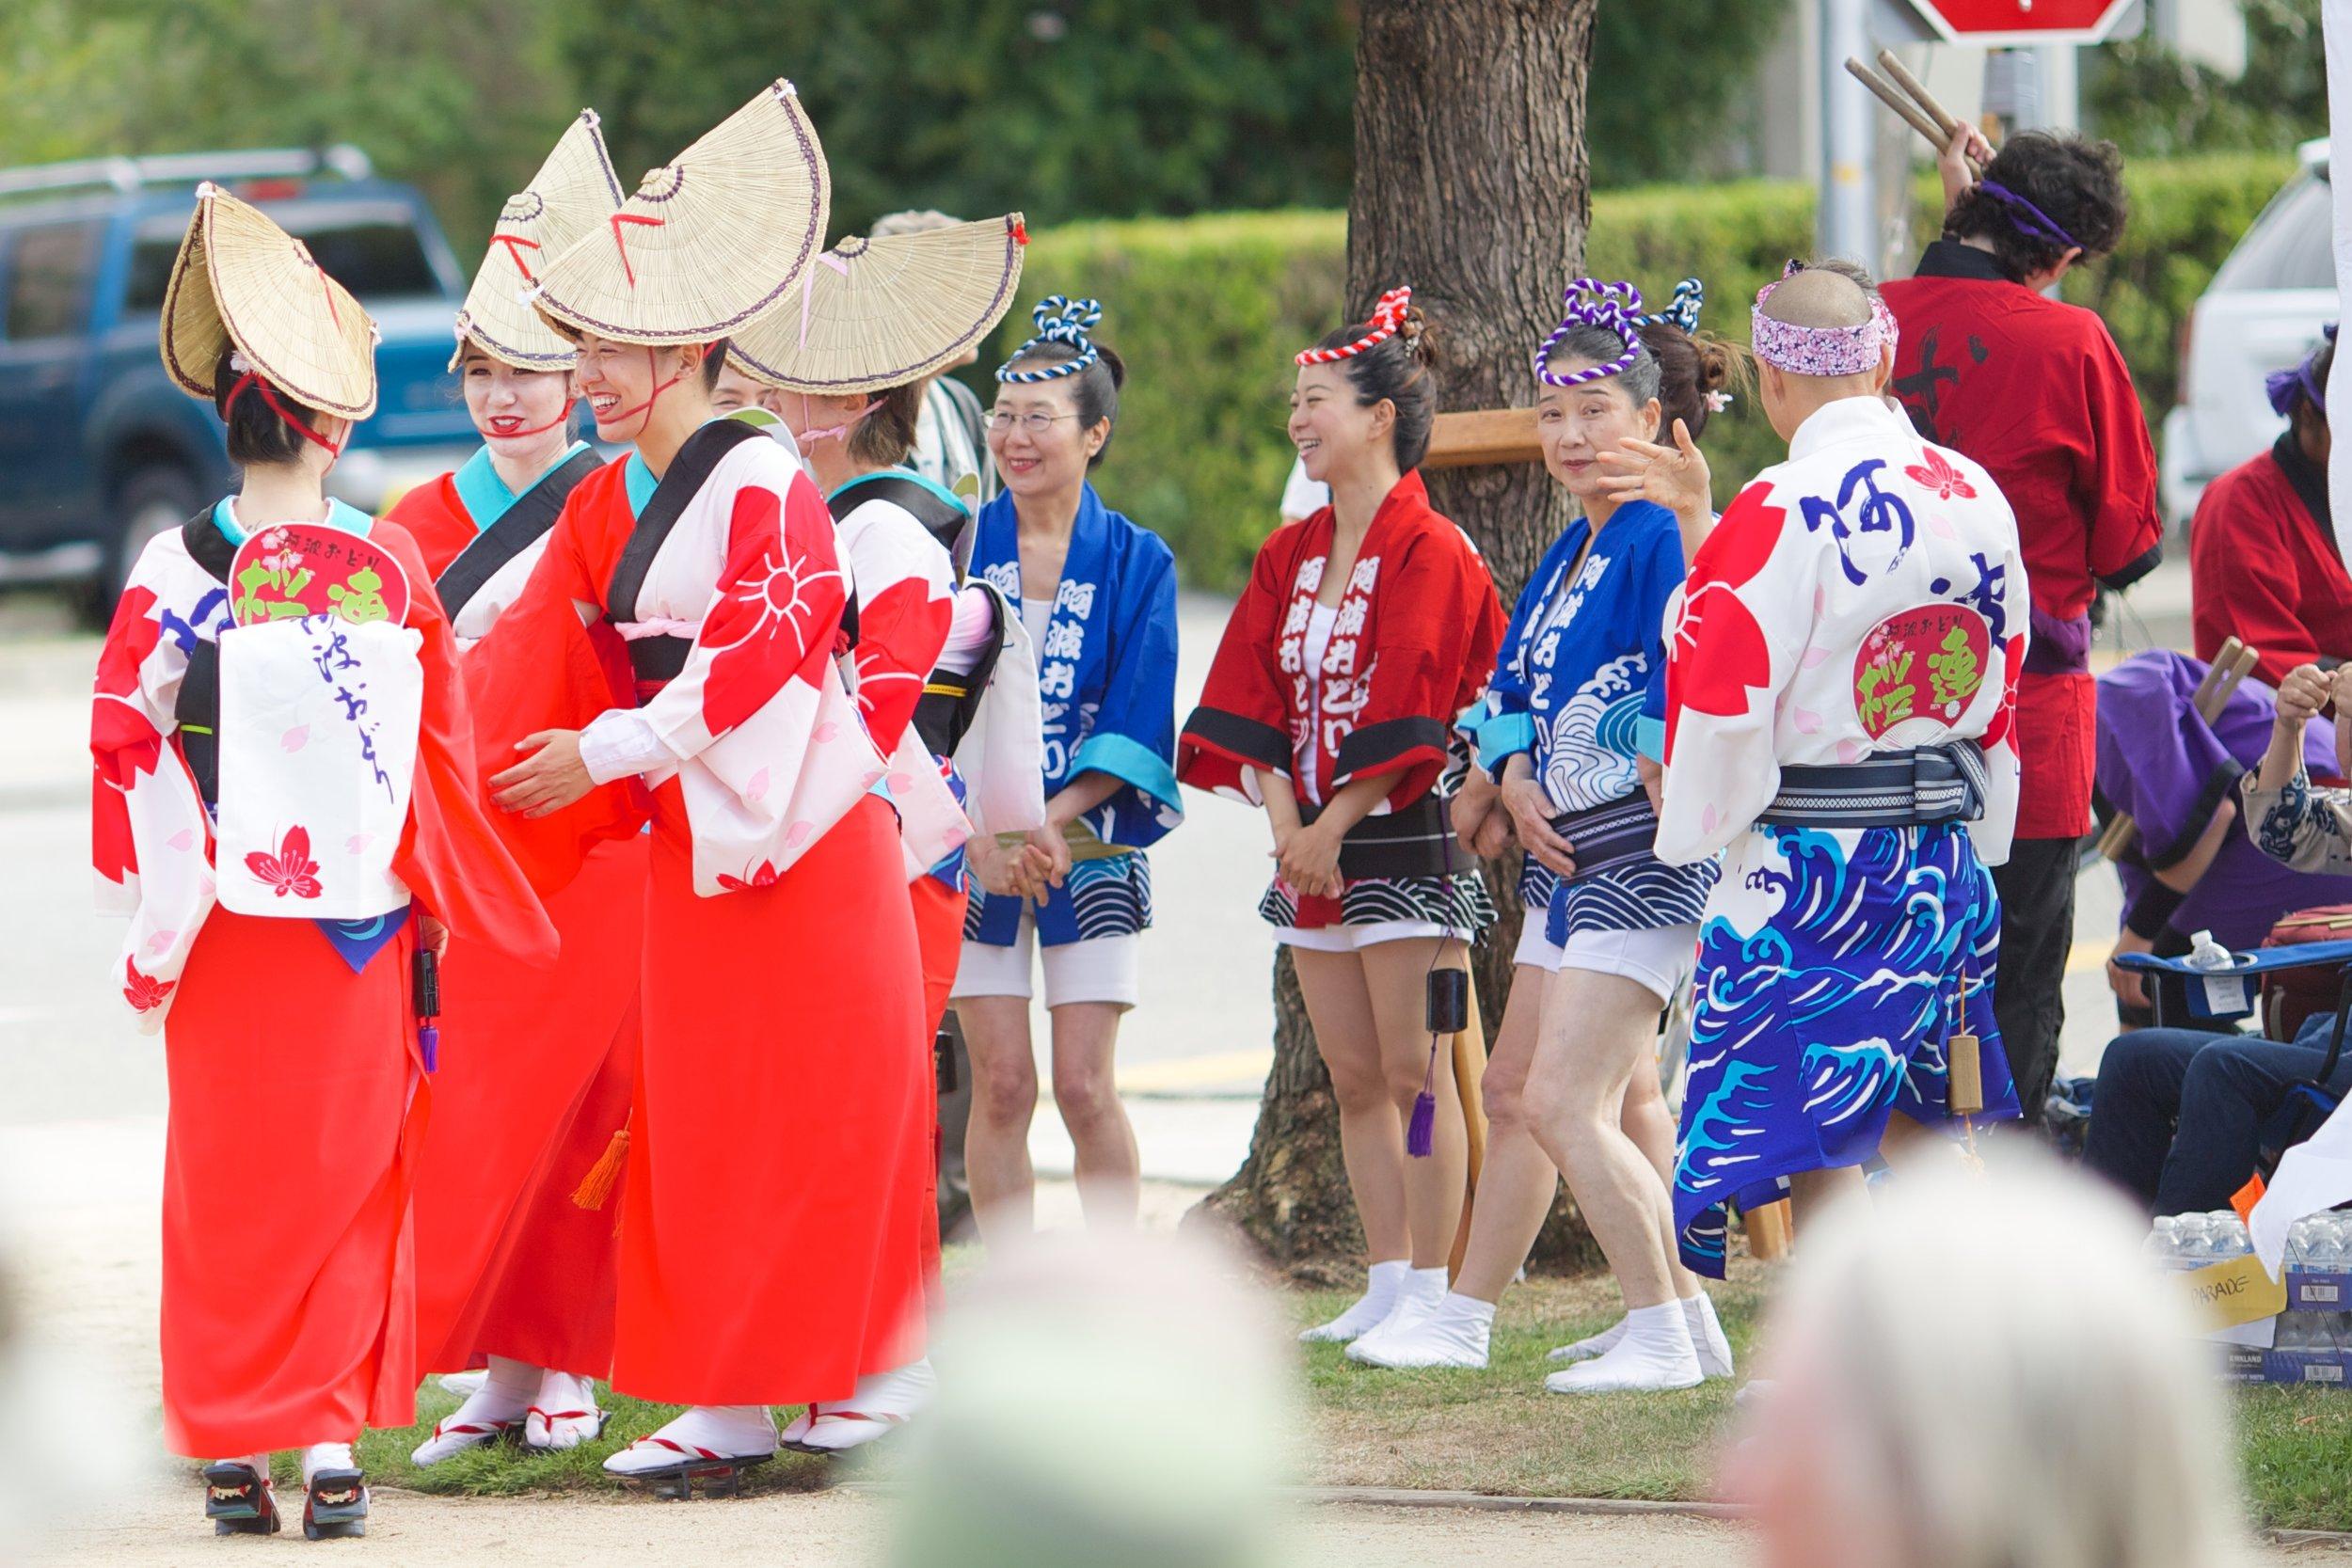 sakura-ren---japanese-cultural-fair-of-santa-cruz-2015_19410050569_o.jpg